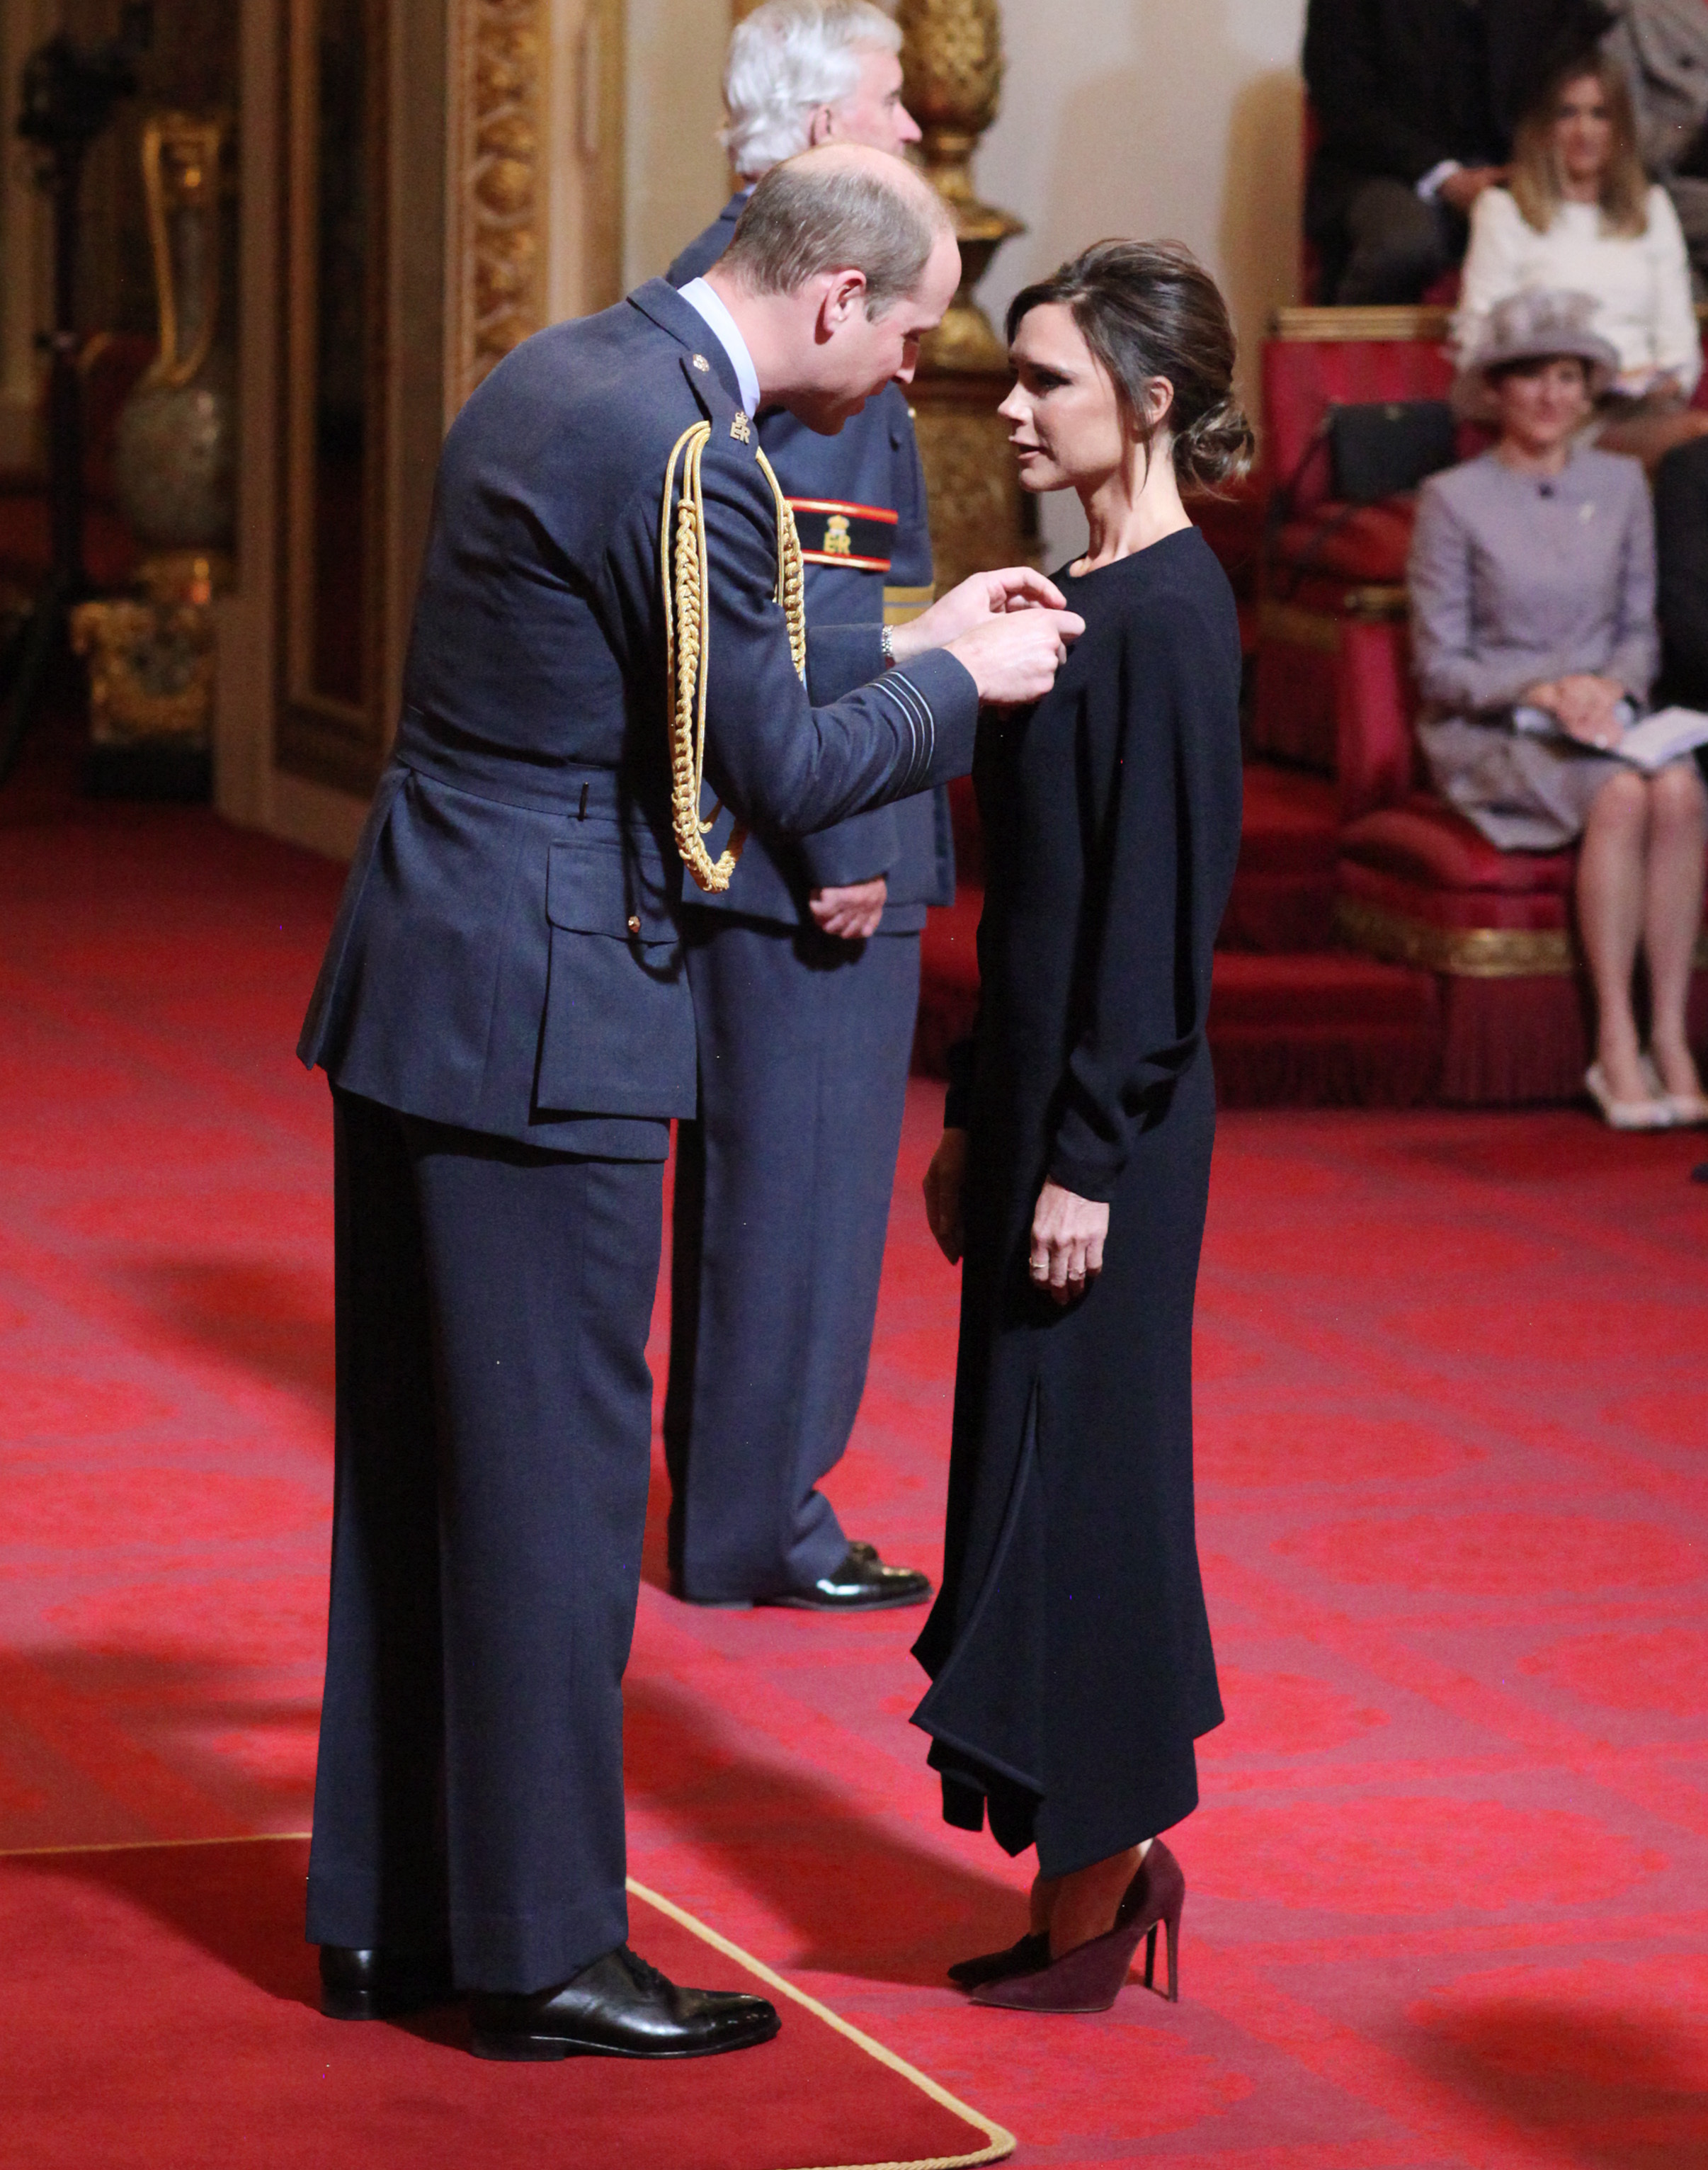 Victoria Beckham and Prince William